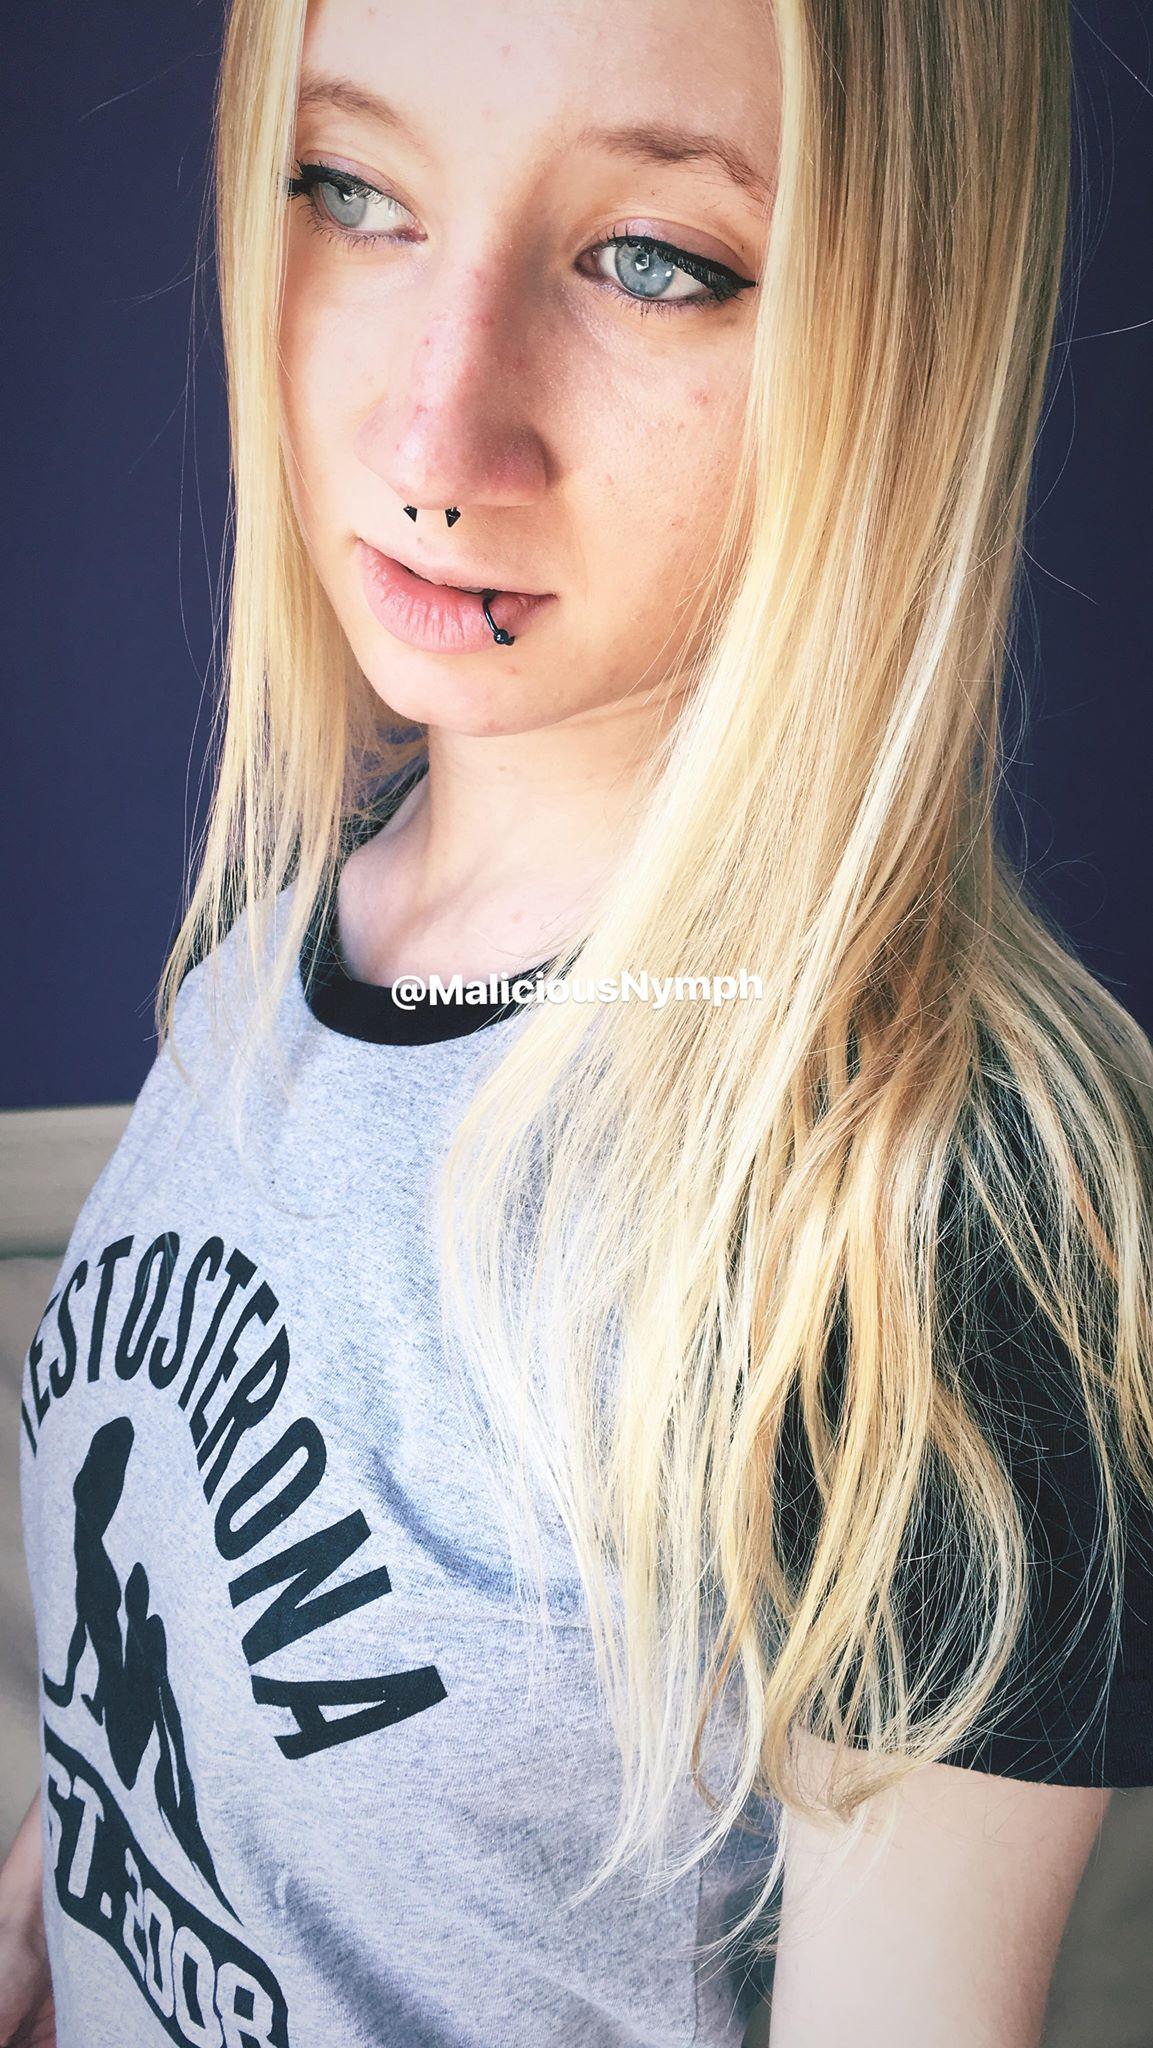 Carol MaliciousNymph - Testosterona Girl